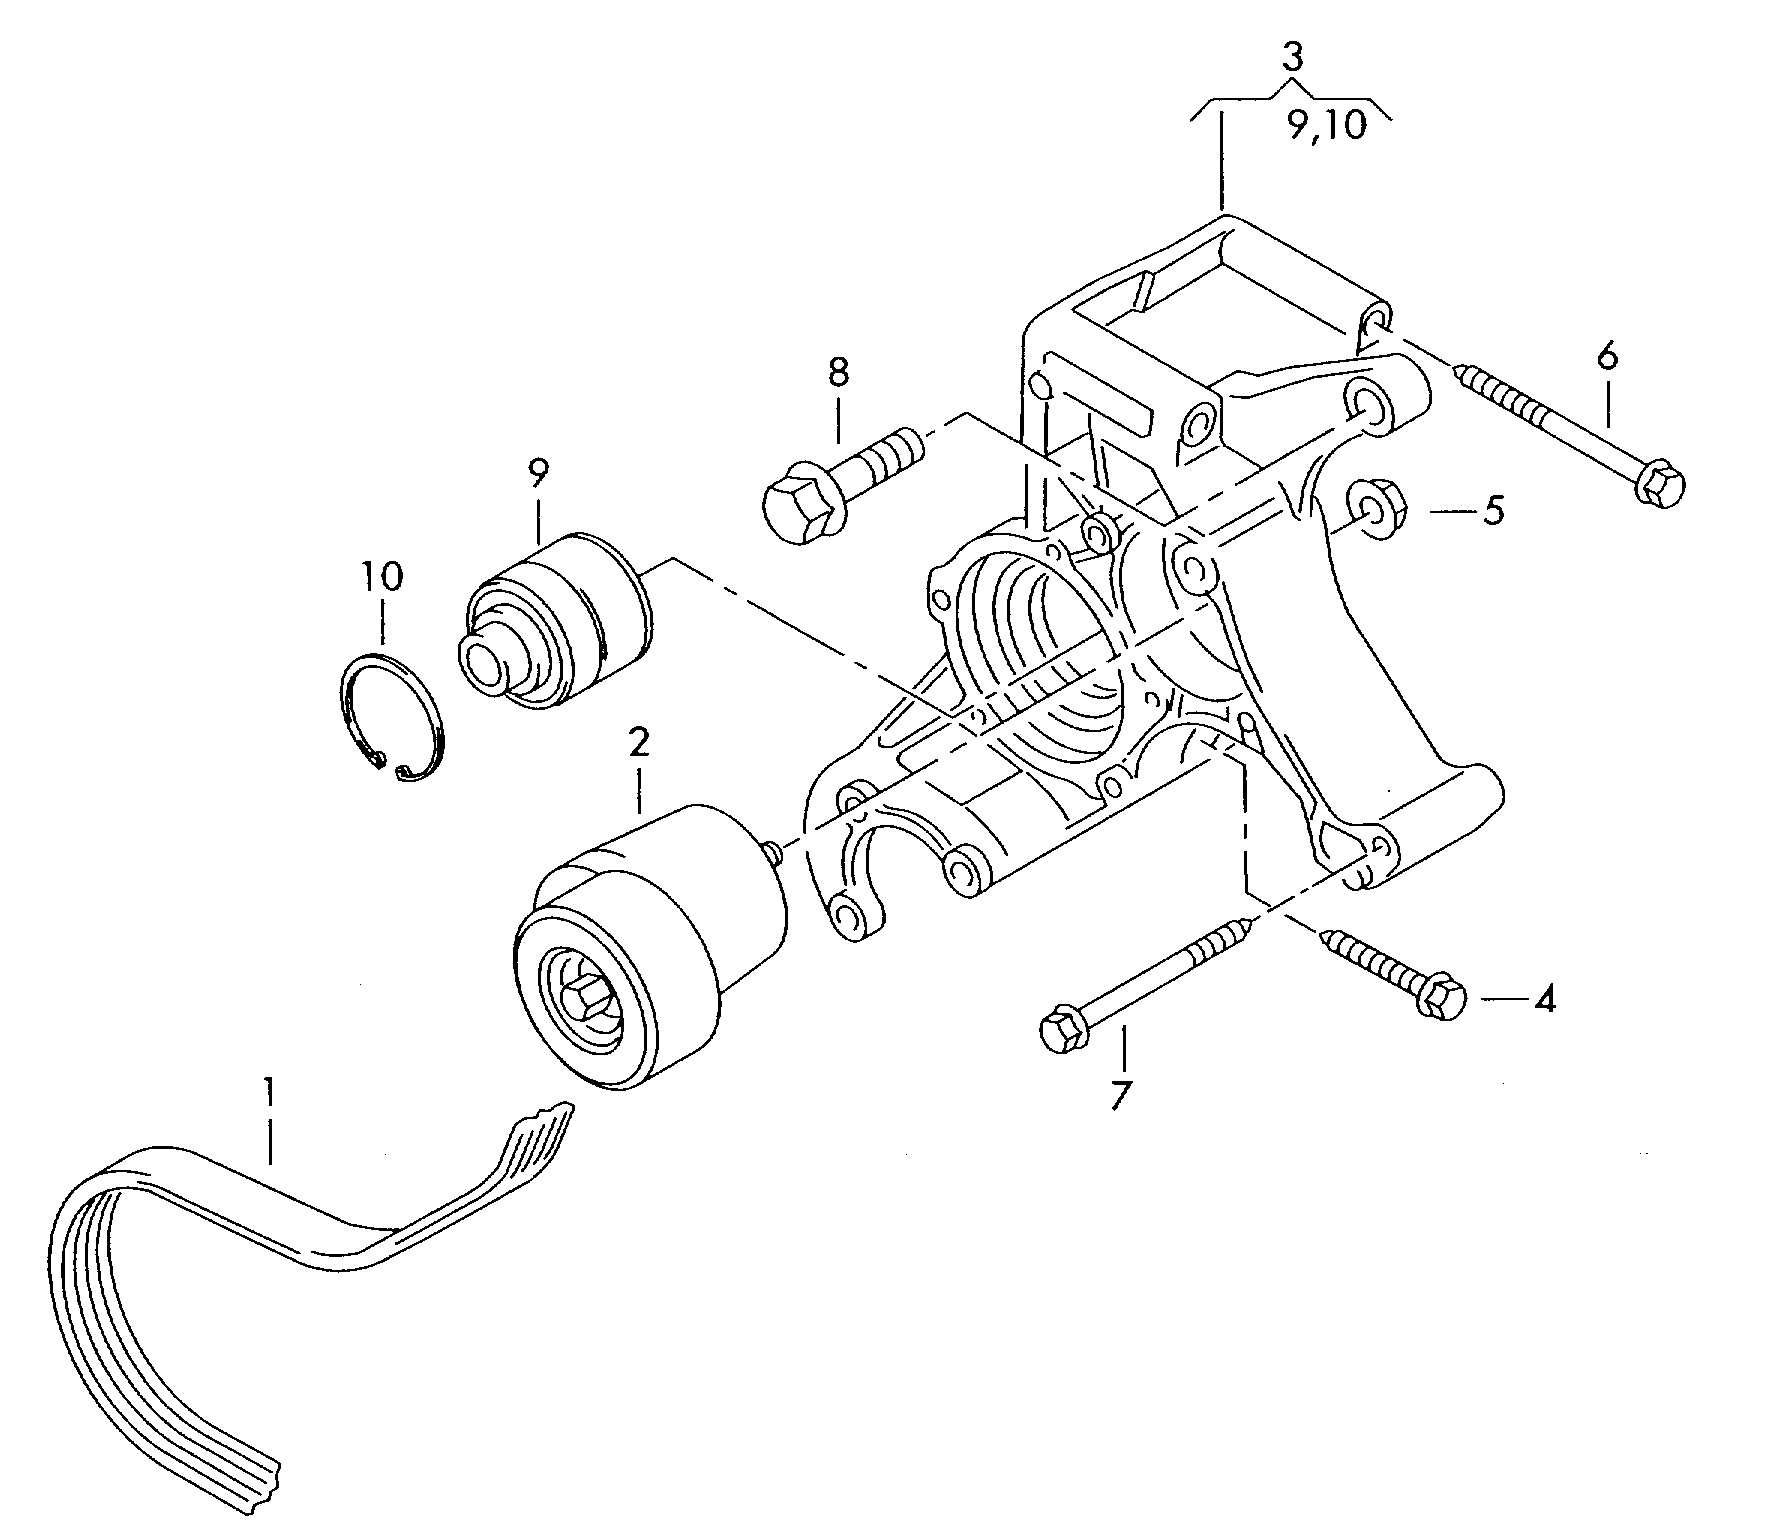 VW, Passat/Variant/Santana Europe, 1999, Electrics, 90340